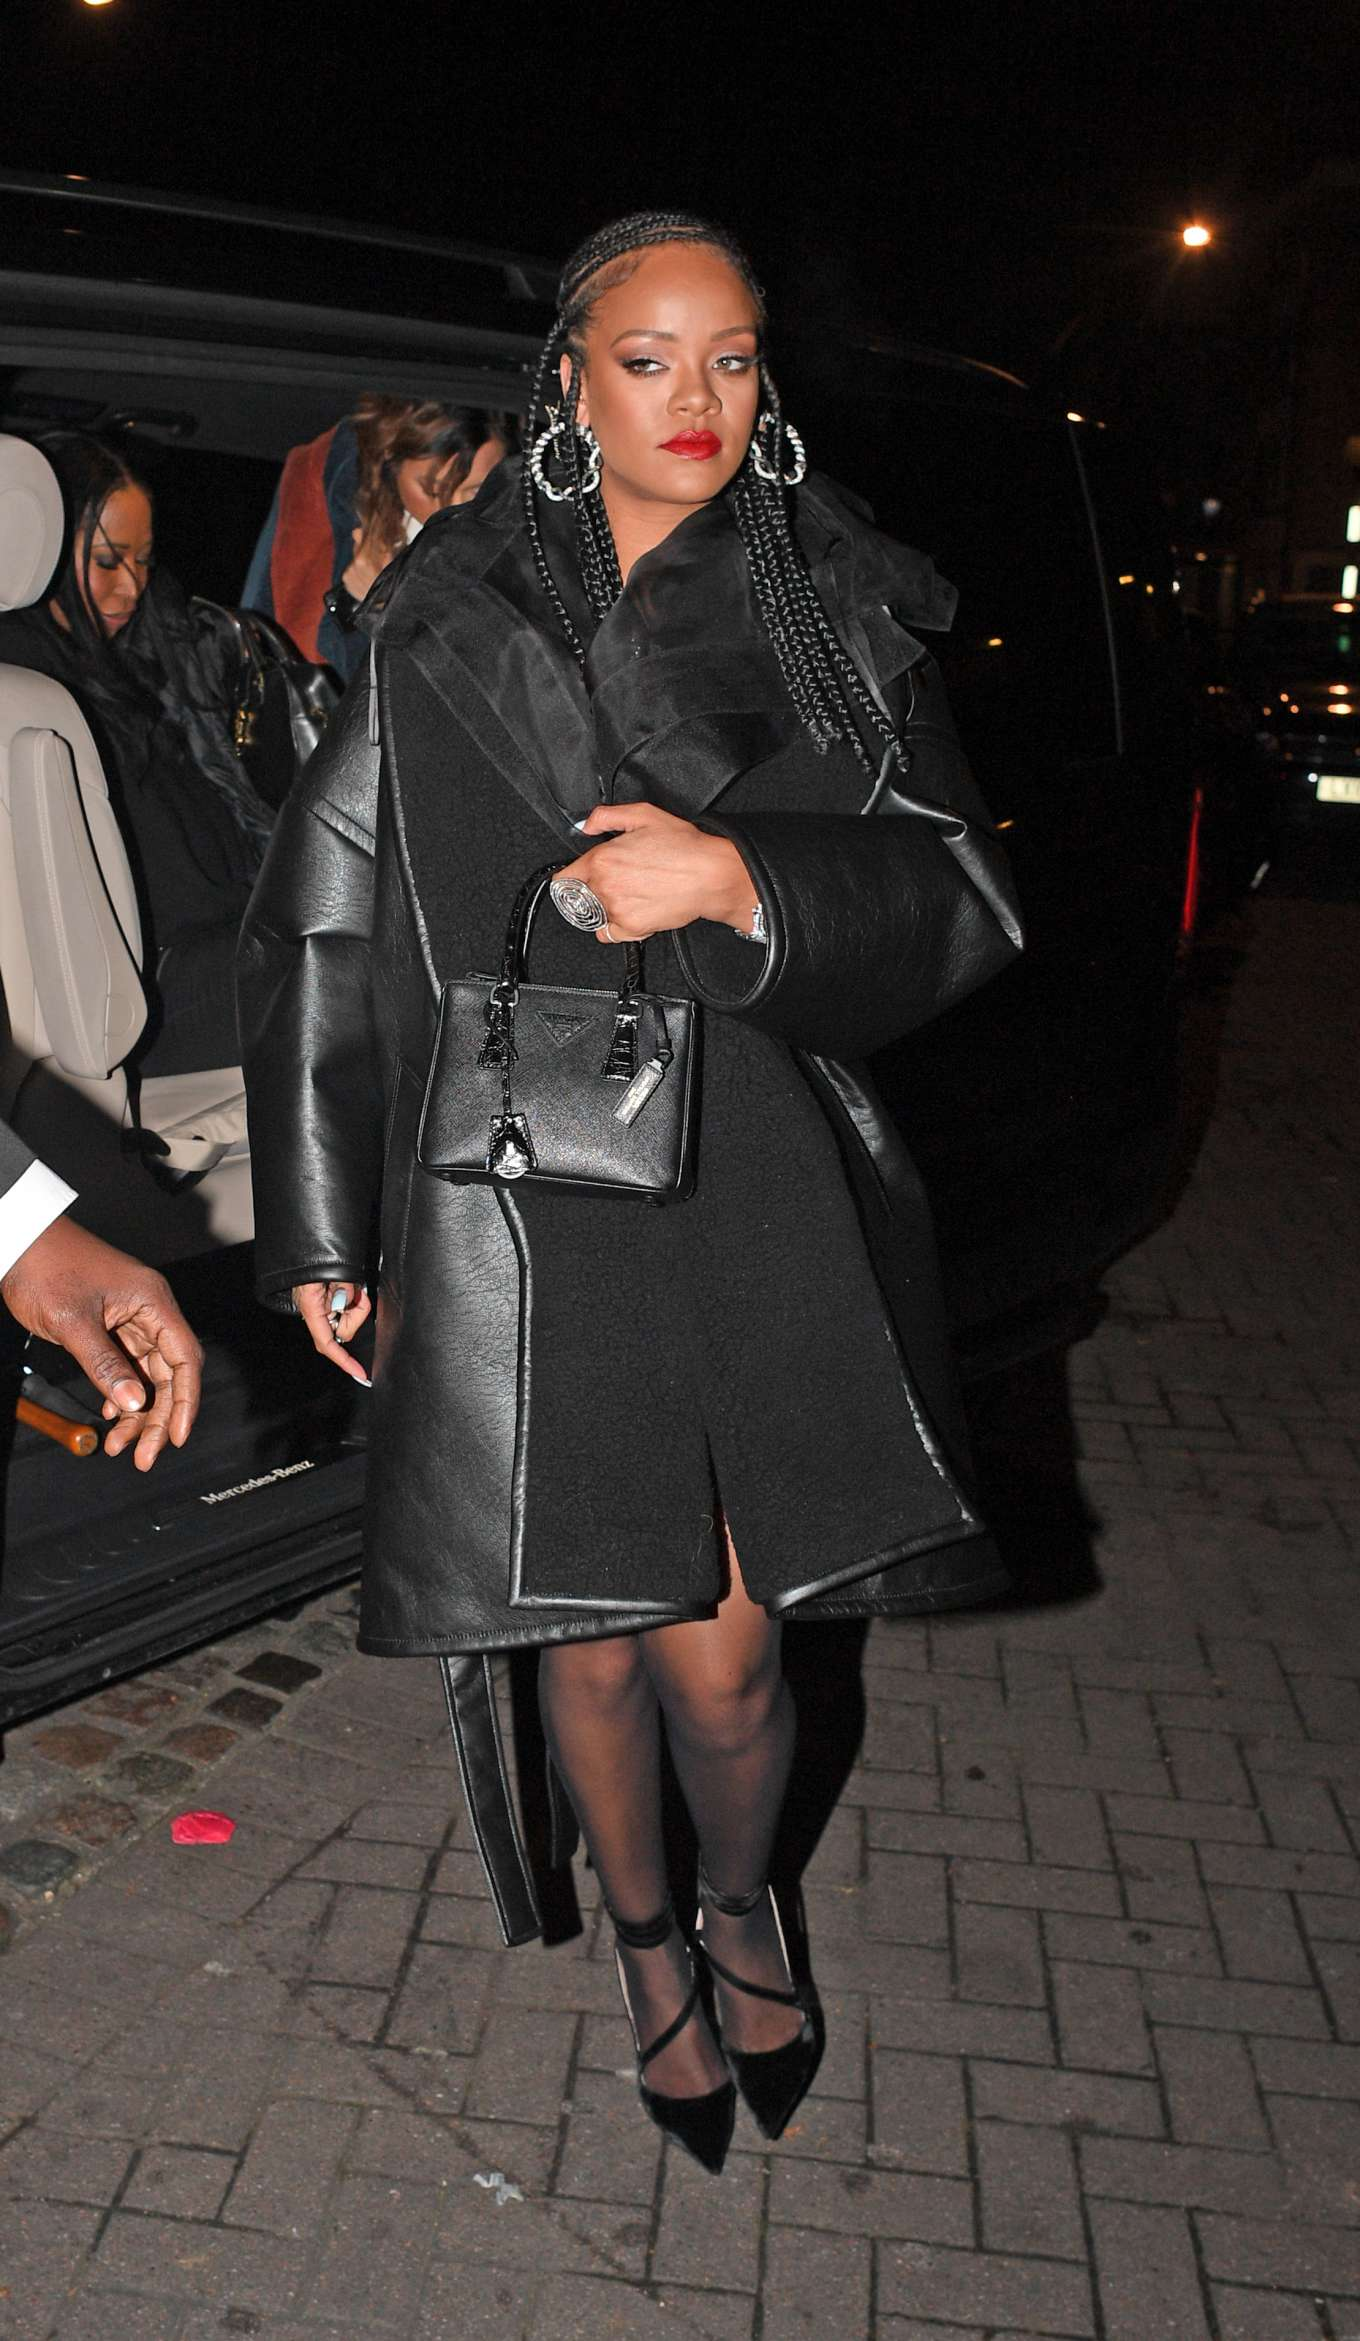 Rihanna - Aarriving at Laylow Nightclub in London